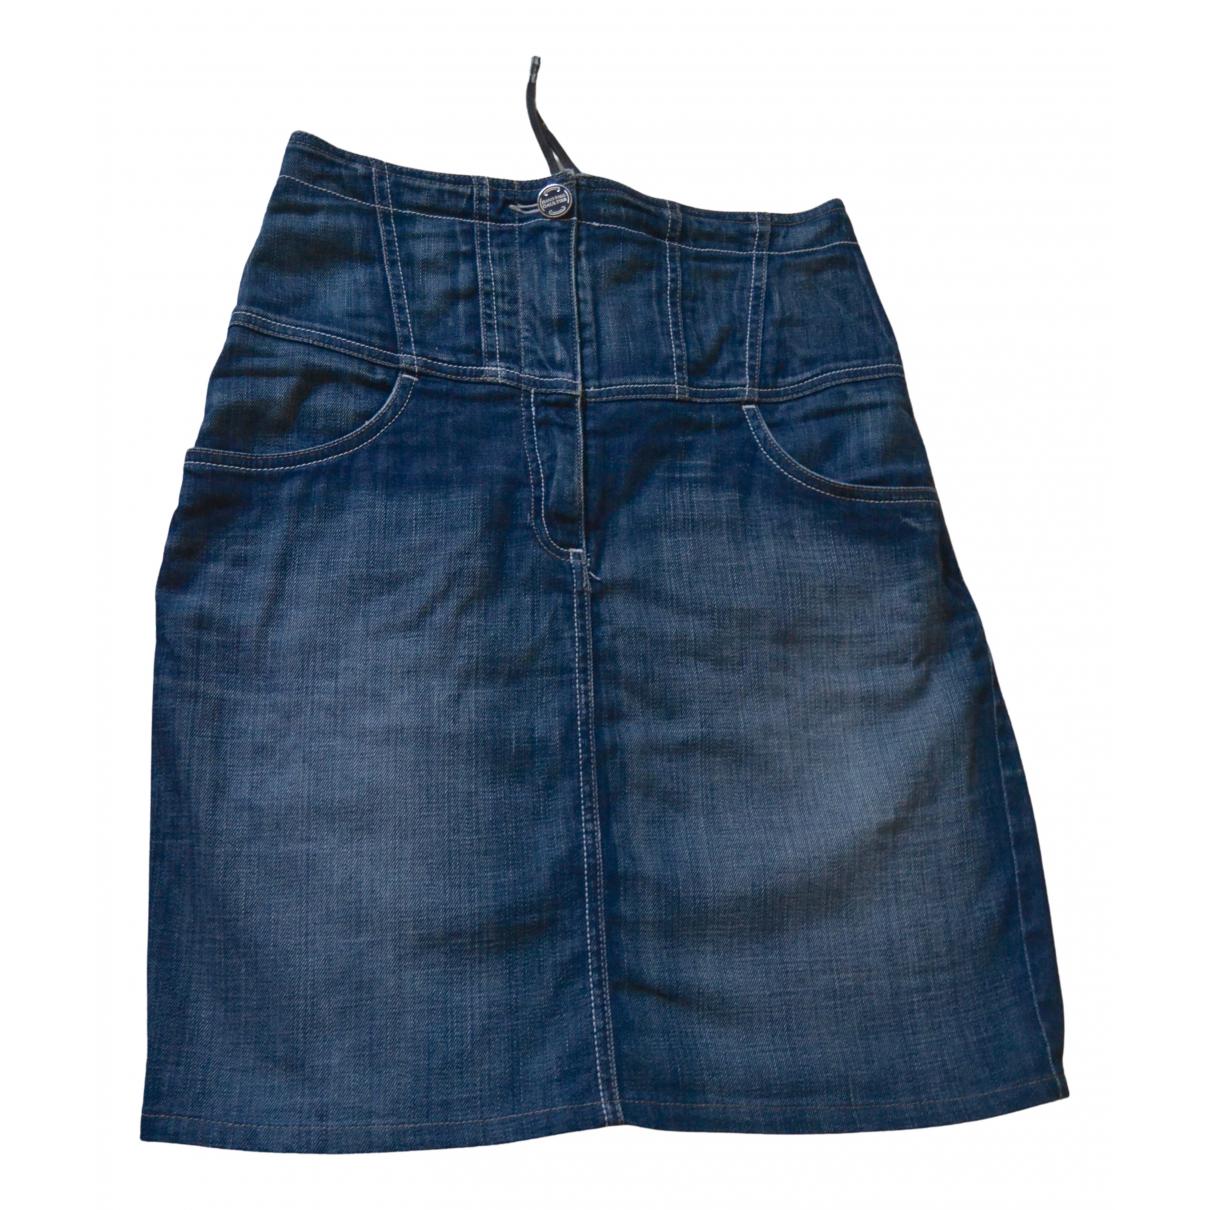 Jean Paul Gaultier \N Blue Denim - Jeans skirt for Women M International